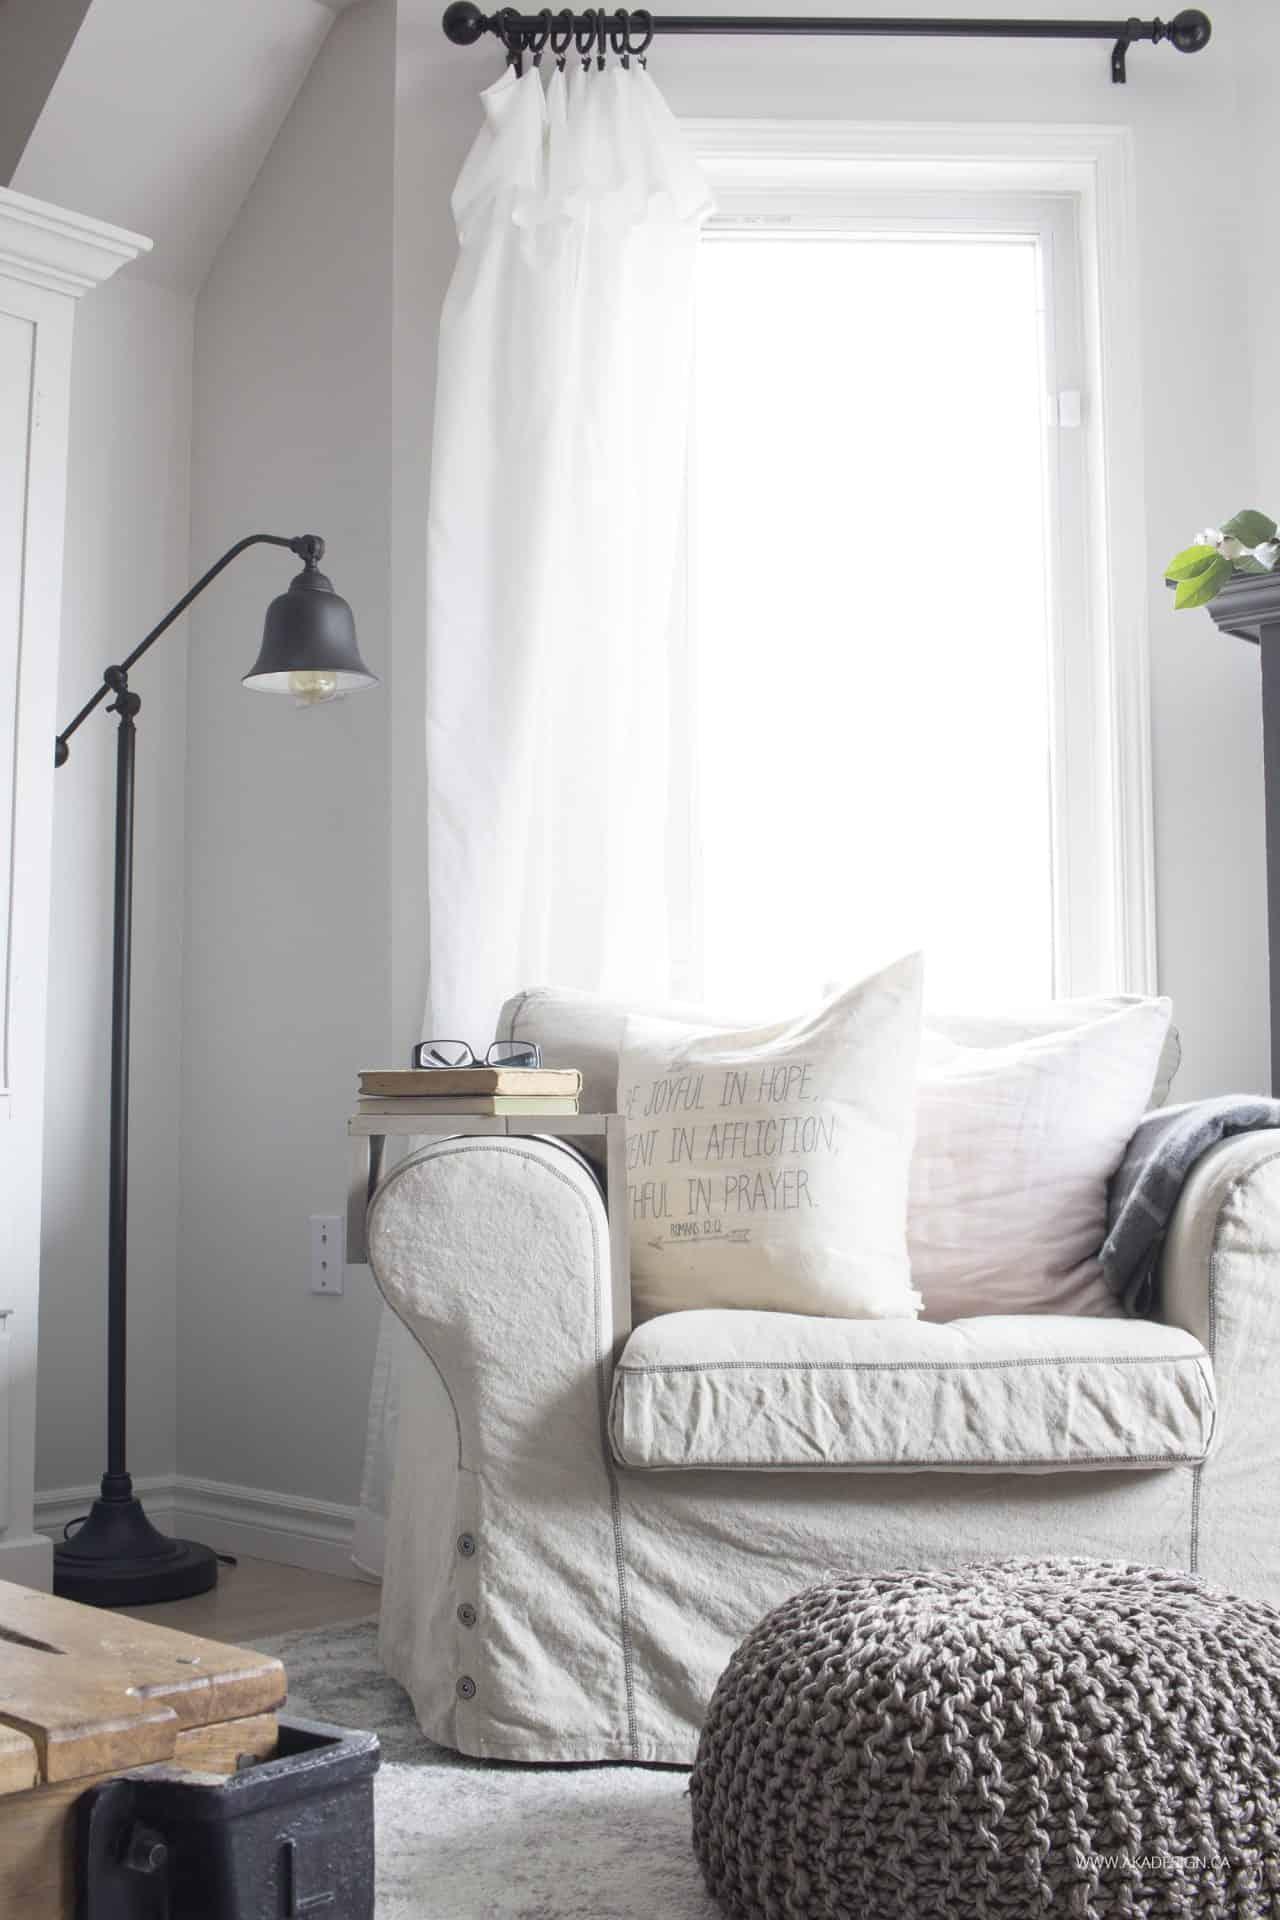 Ikea Ektorp Armchair with arm rest